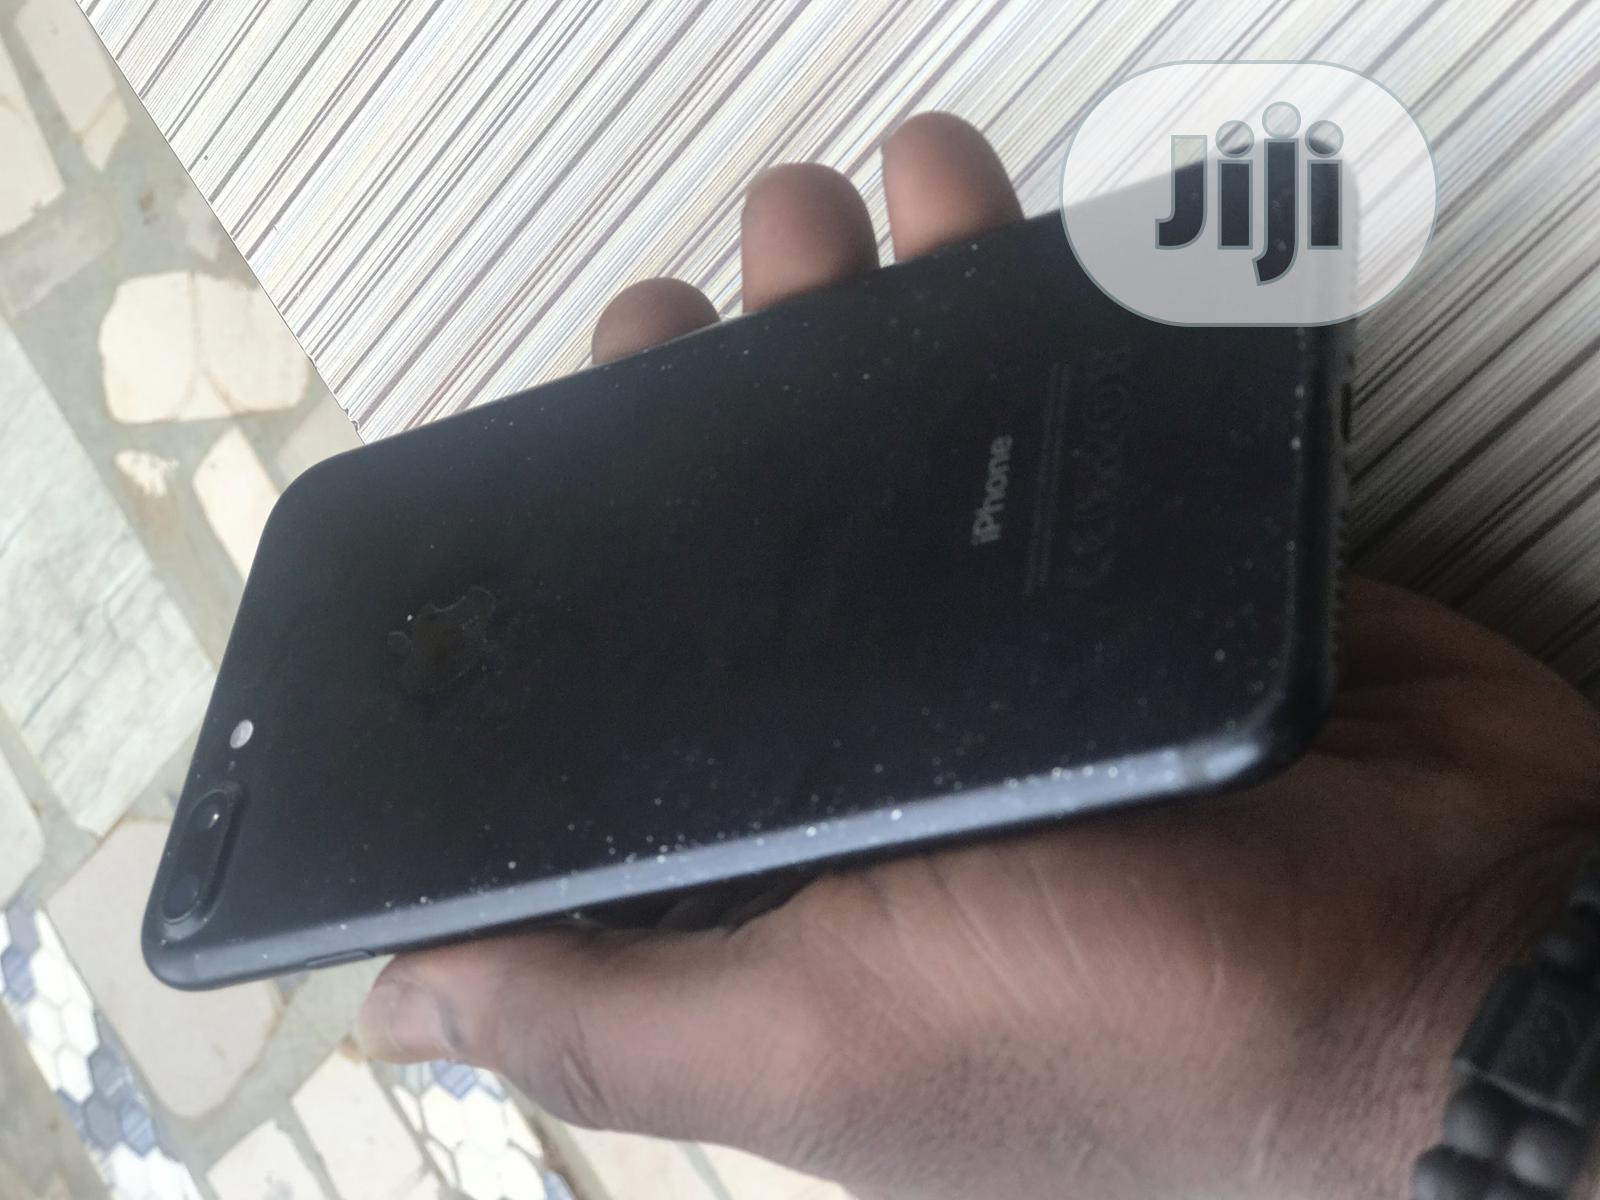 Apple iPhone 7 Plus 32 GB Black | Mobile Phones for sale in Ilorin South, Kwara State, Nigeria